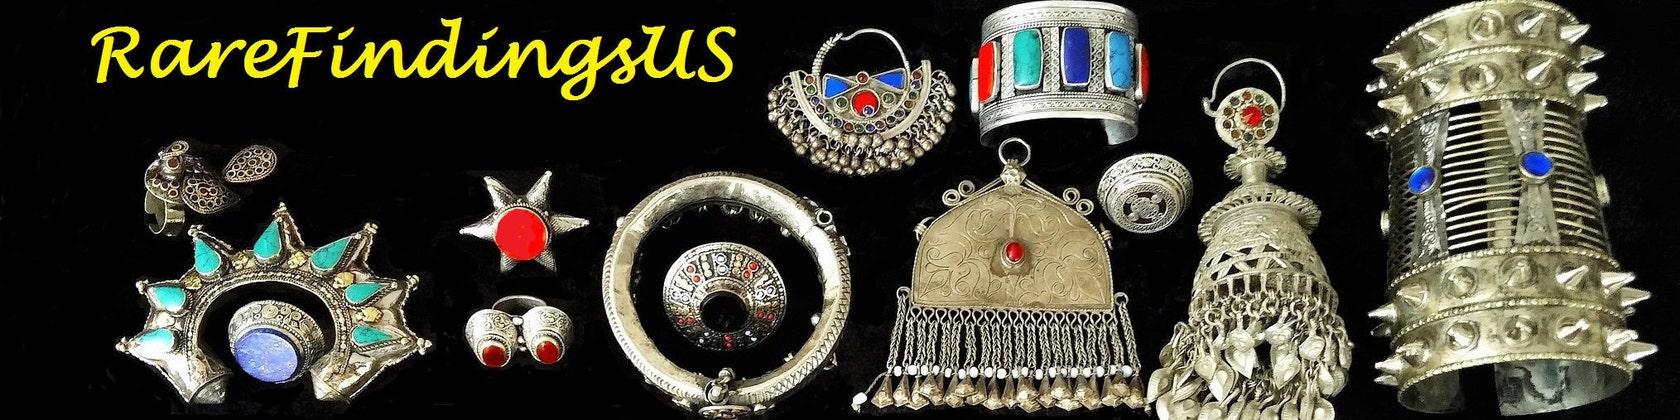 14 Vintage Turkoman Buttons DIY Findings Belly Dancing Costume Supply Dress Designing Tribal Kuchi Afghan Boho Handmade Rare Buttons Tassels